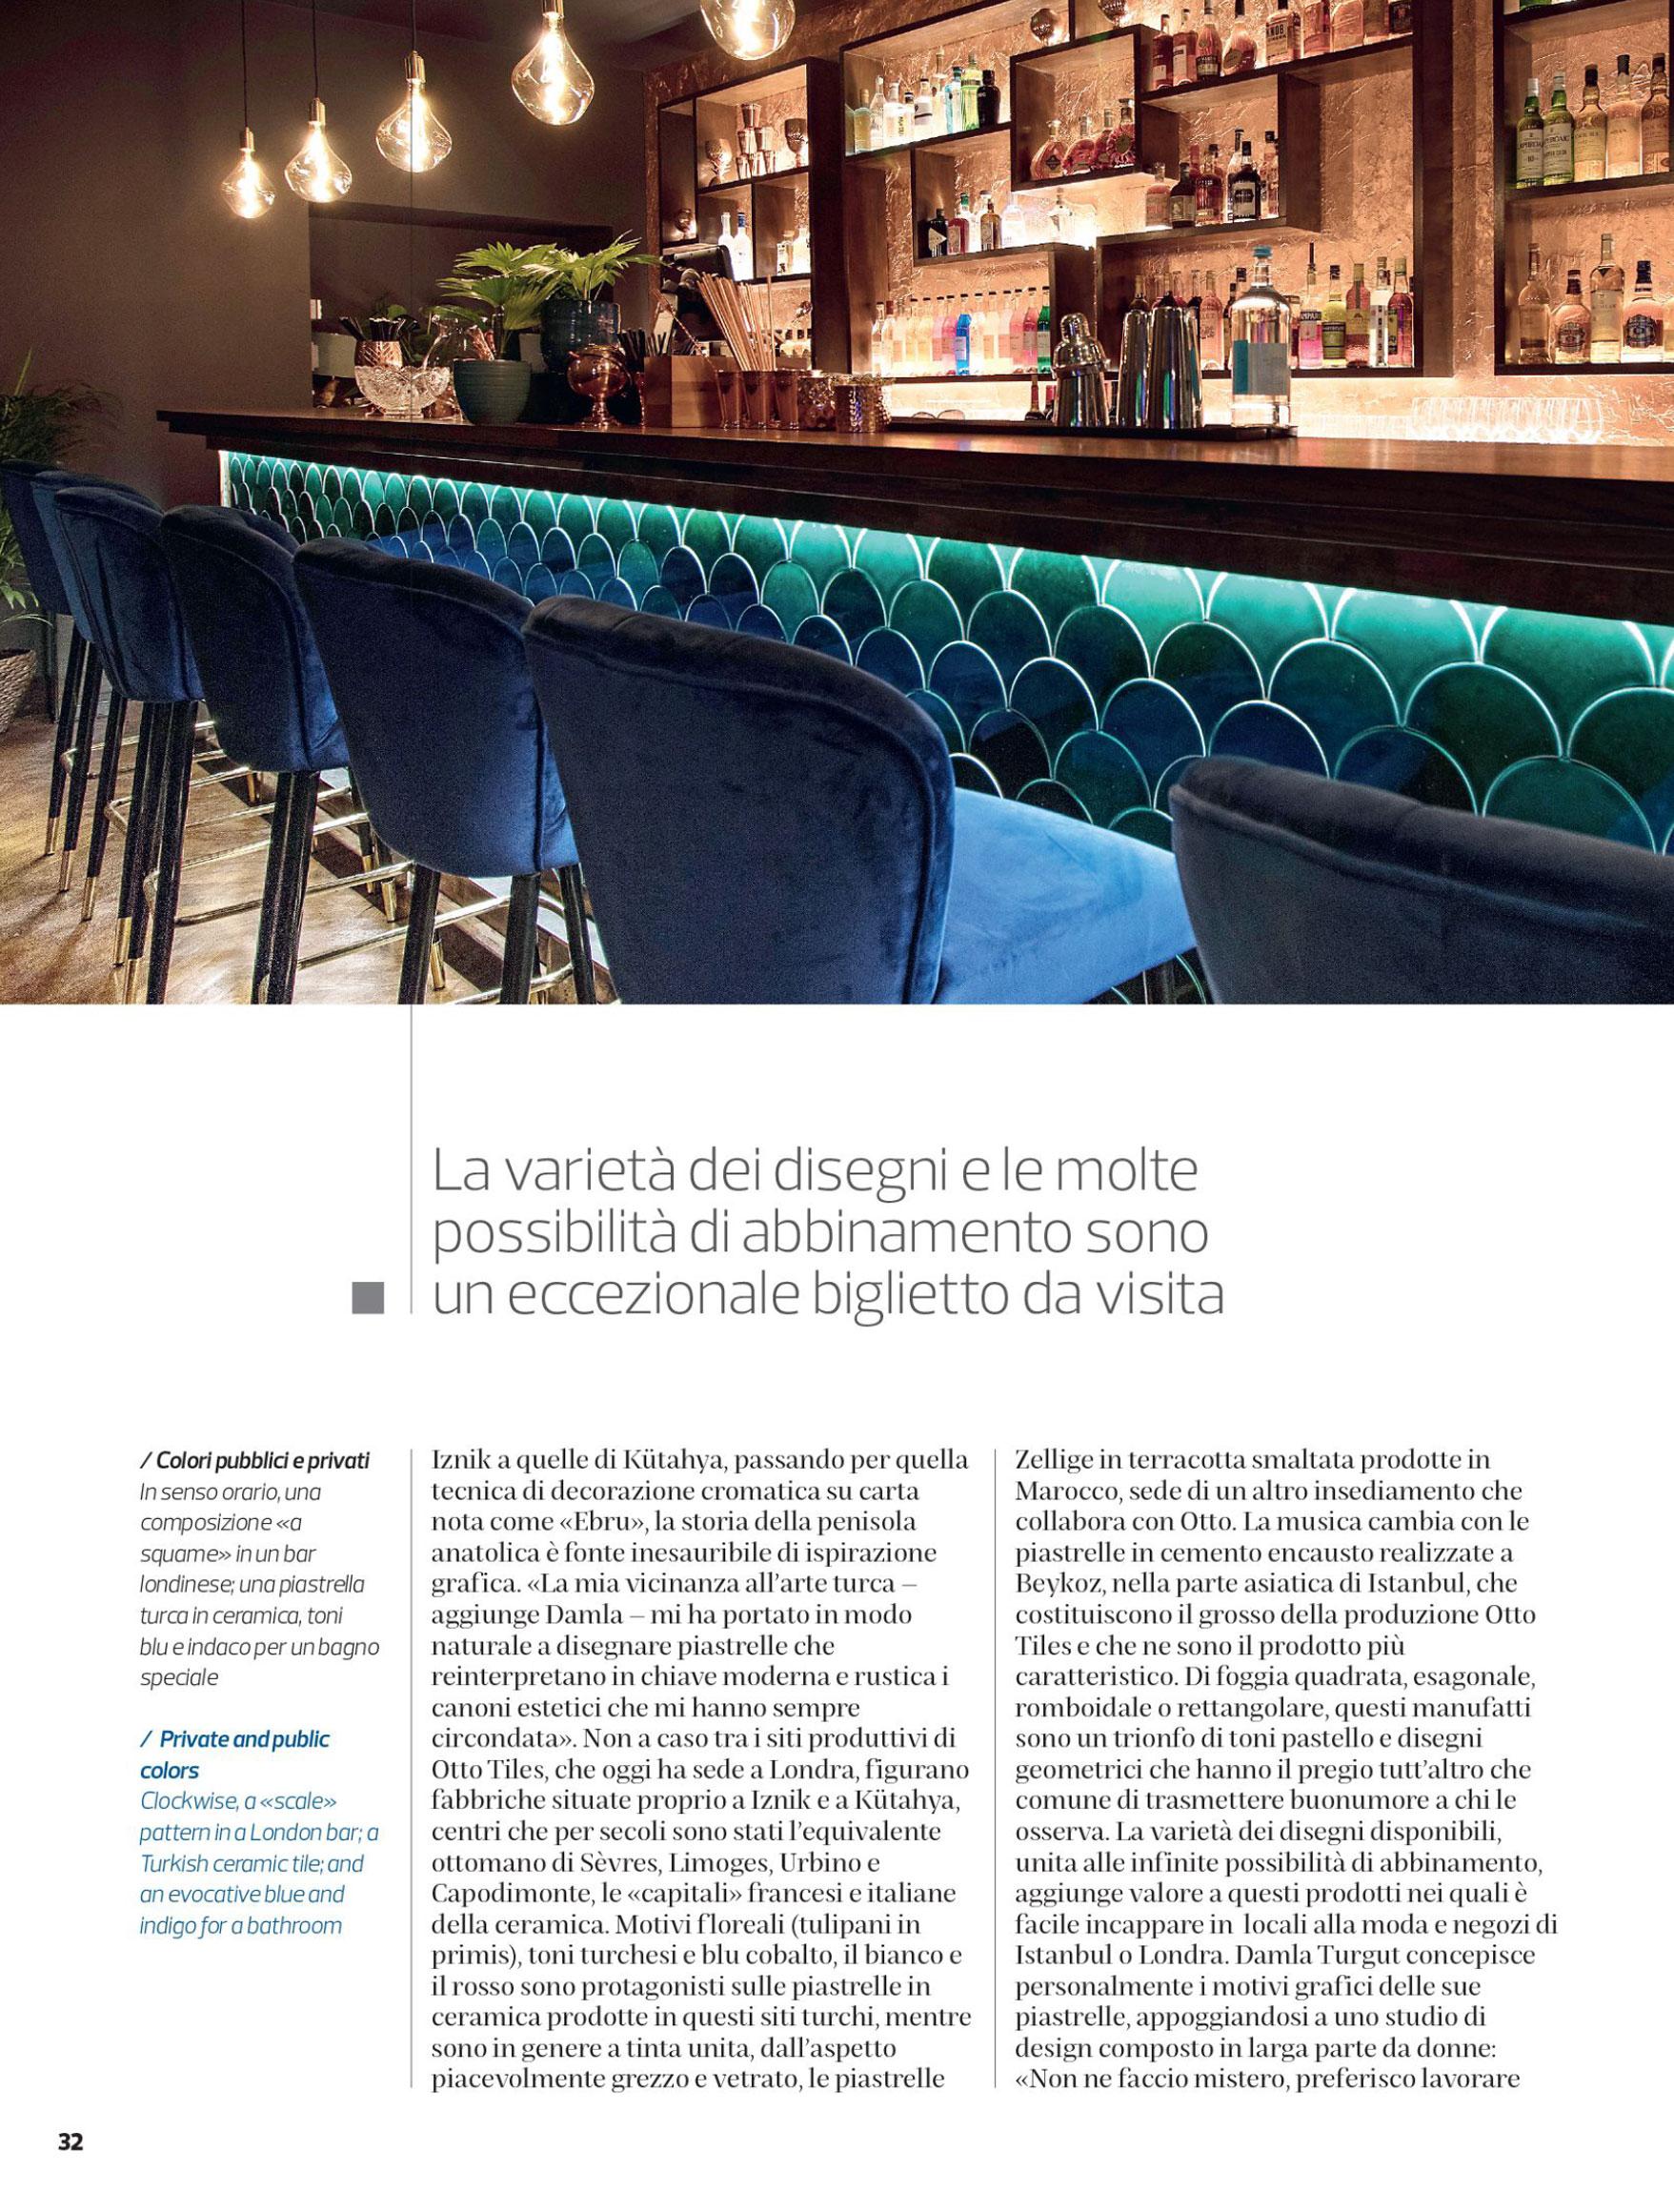 Corriere del Ticino - May 2021